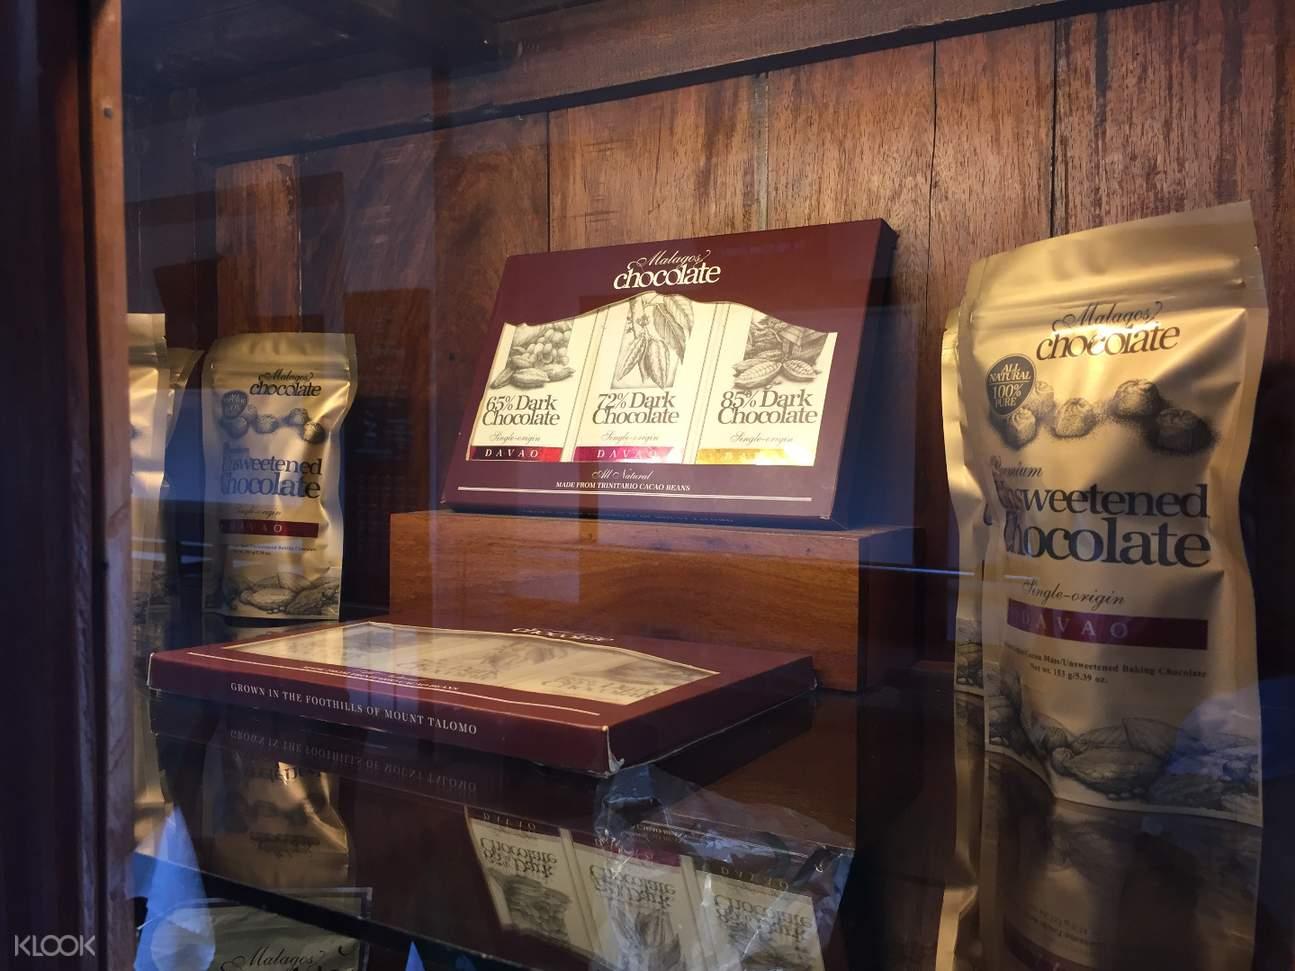 chocolate museum history display